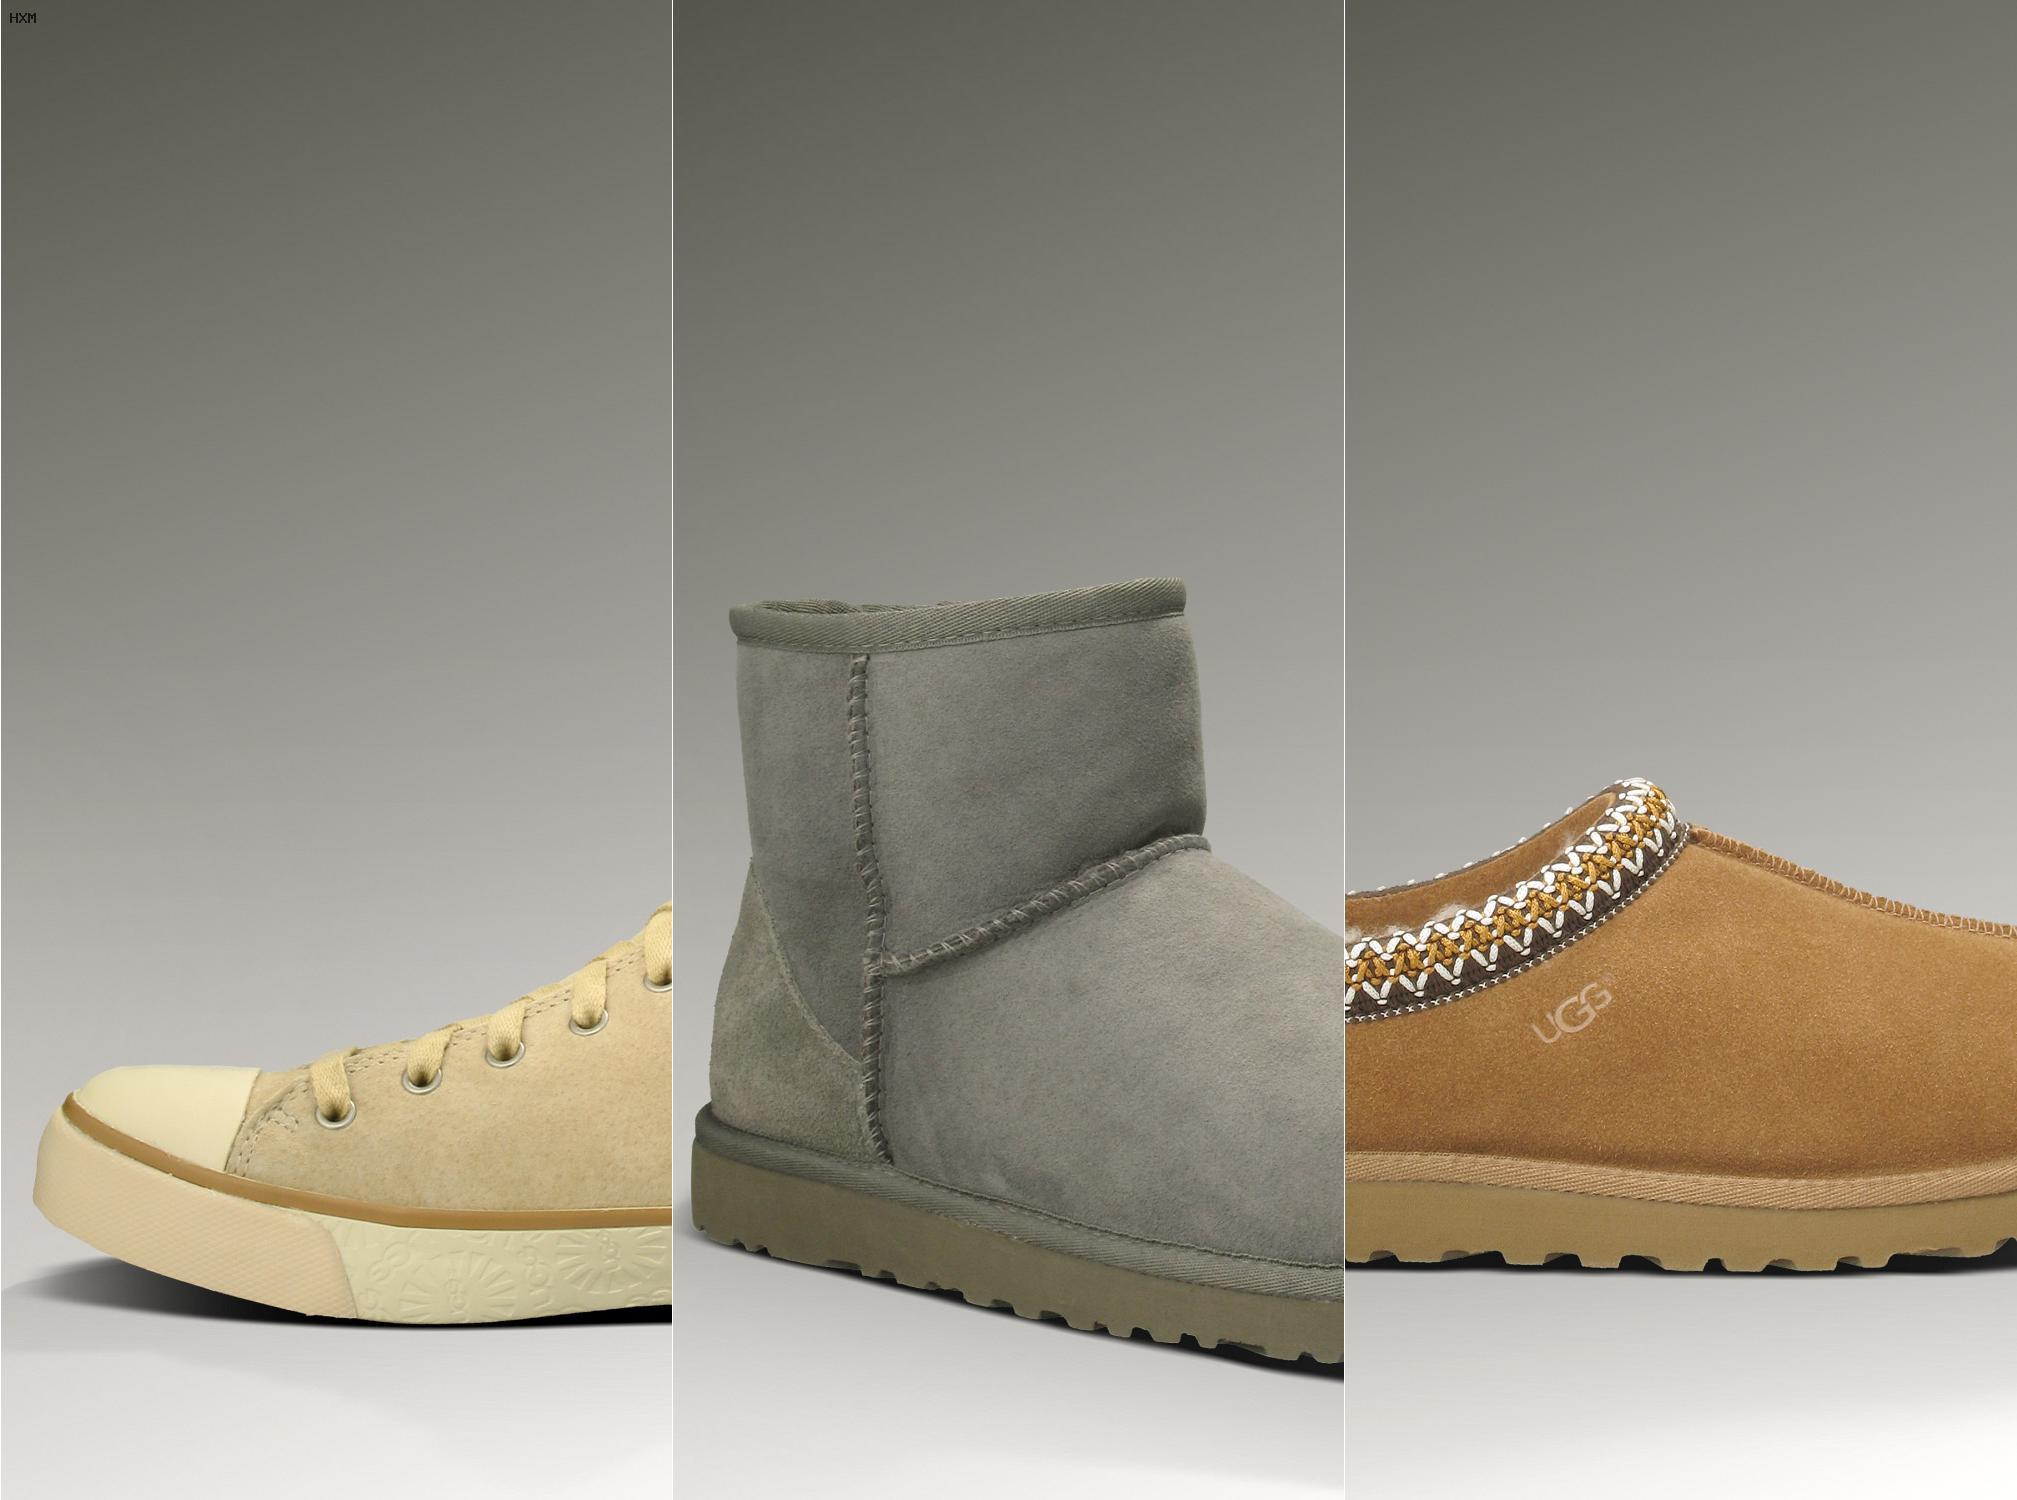 Ugg Boots 5825